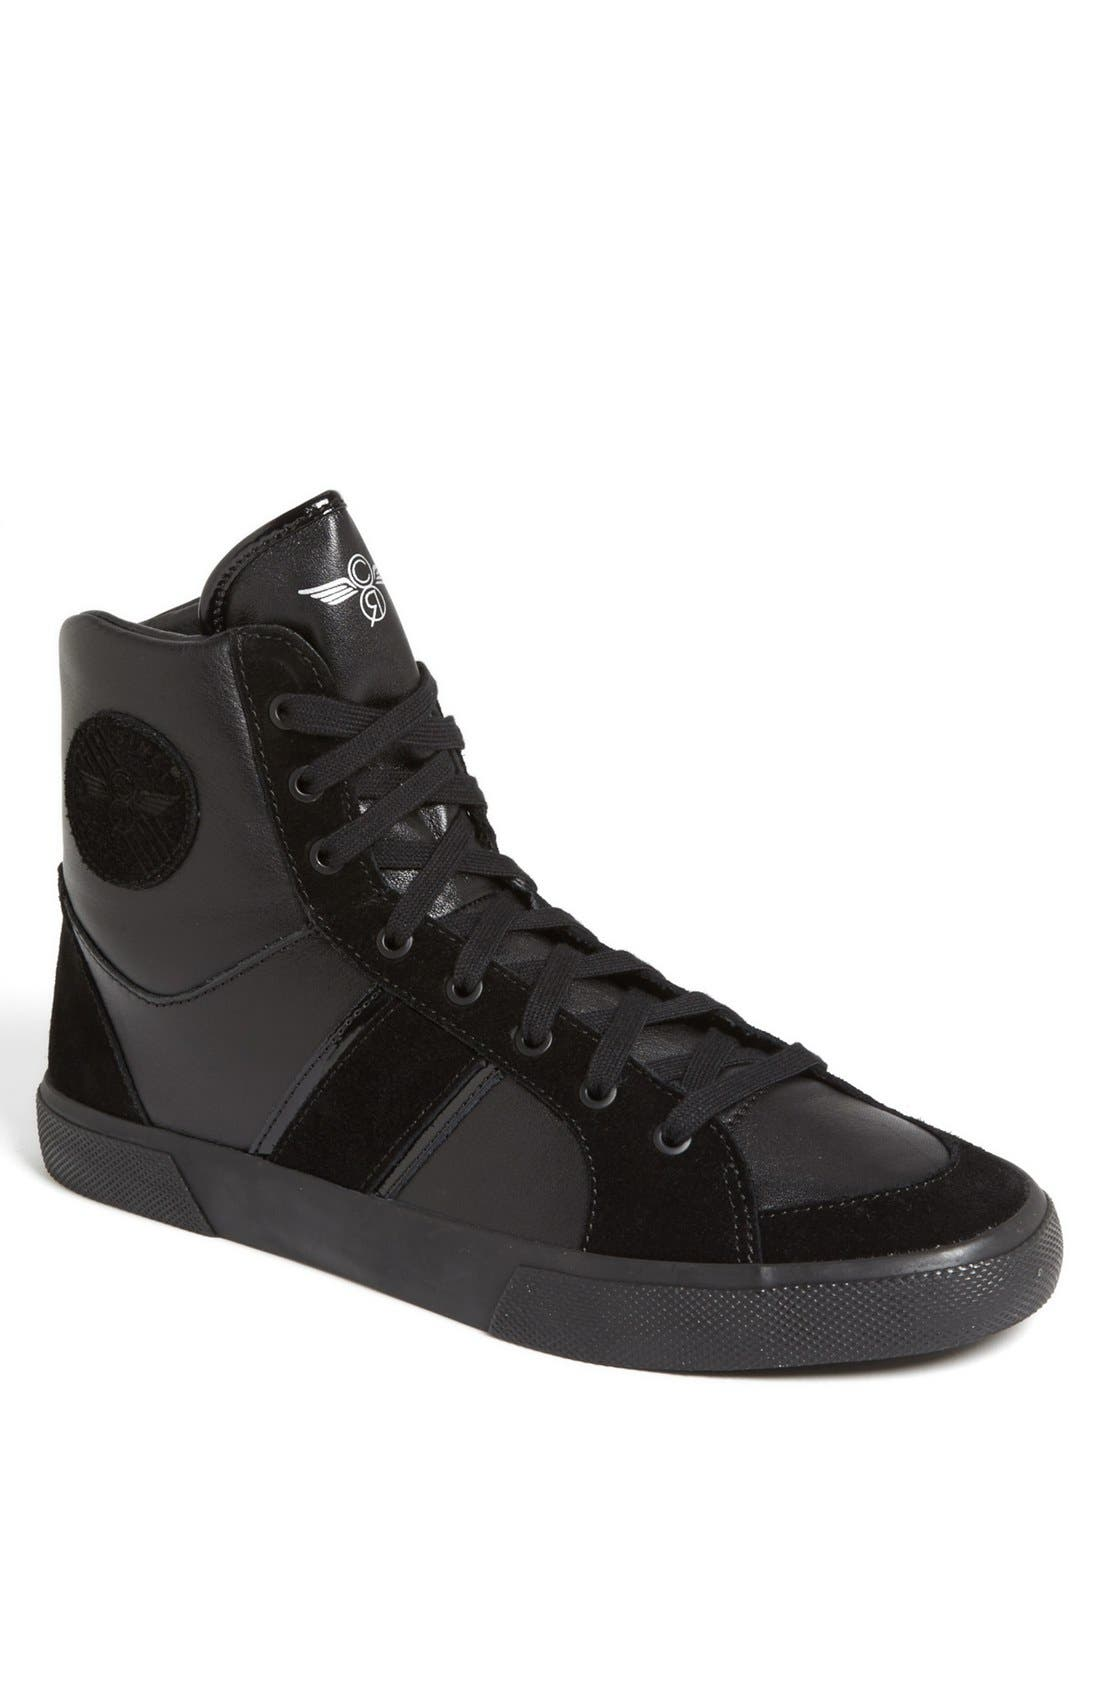 Alternate Image 1 Selected - Creative Recreation 'Fenelli' High Top Sneaker